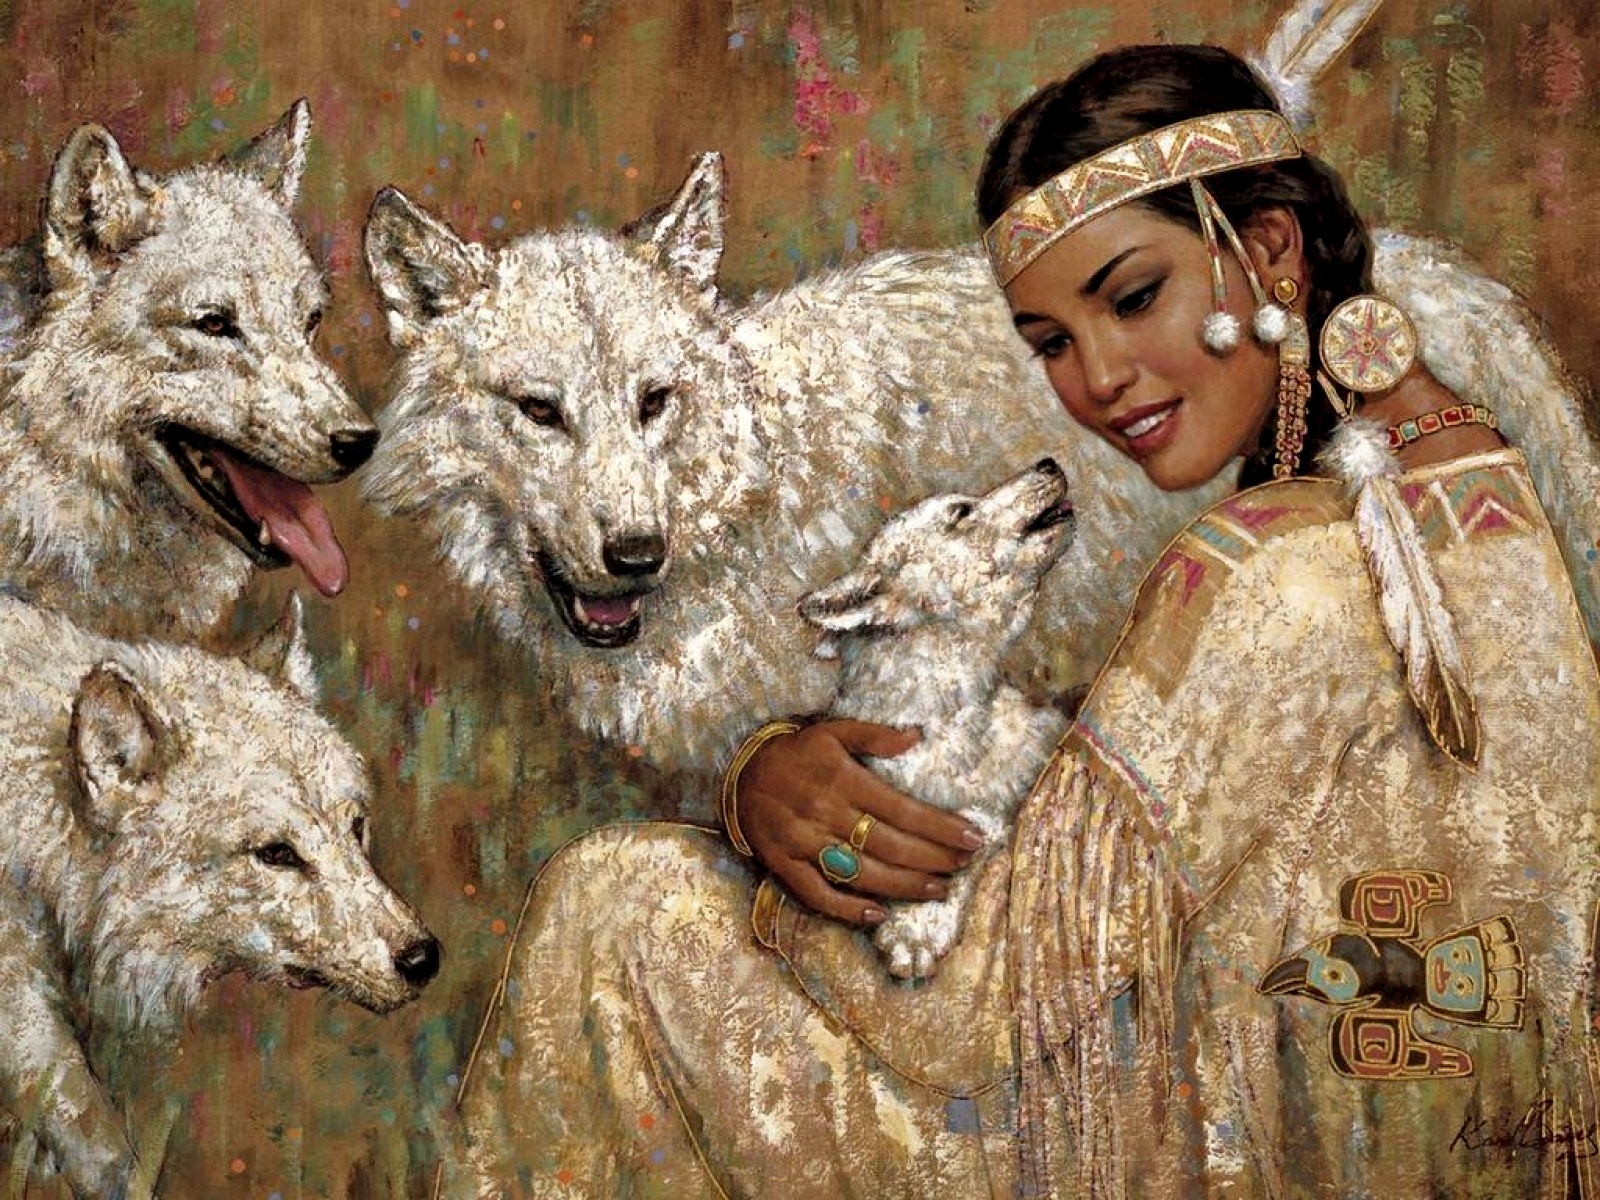 Native American   Native Americans Photo 34175269 1600x1200